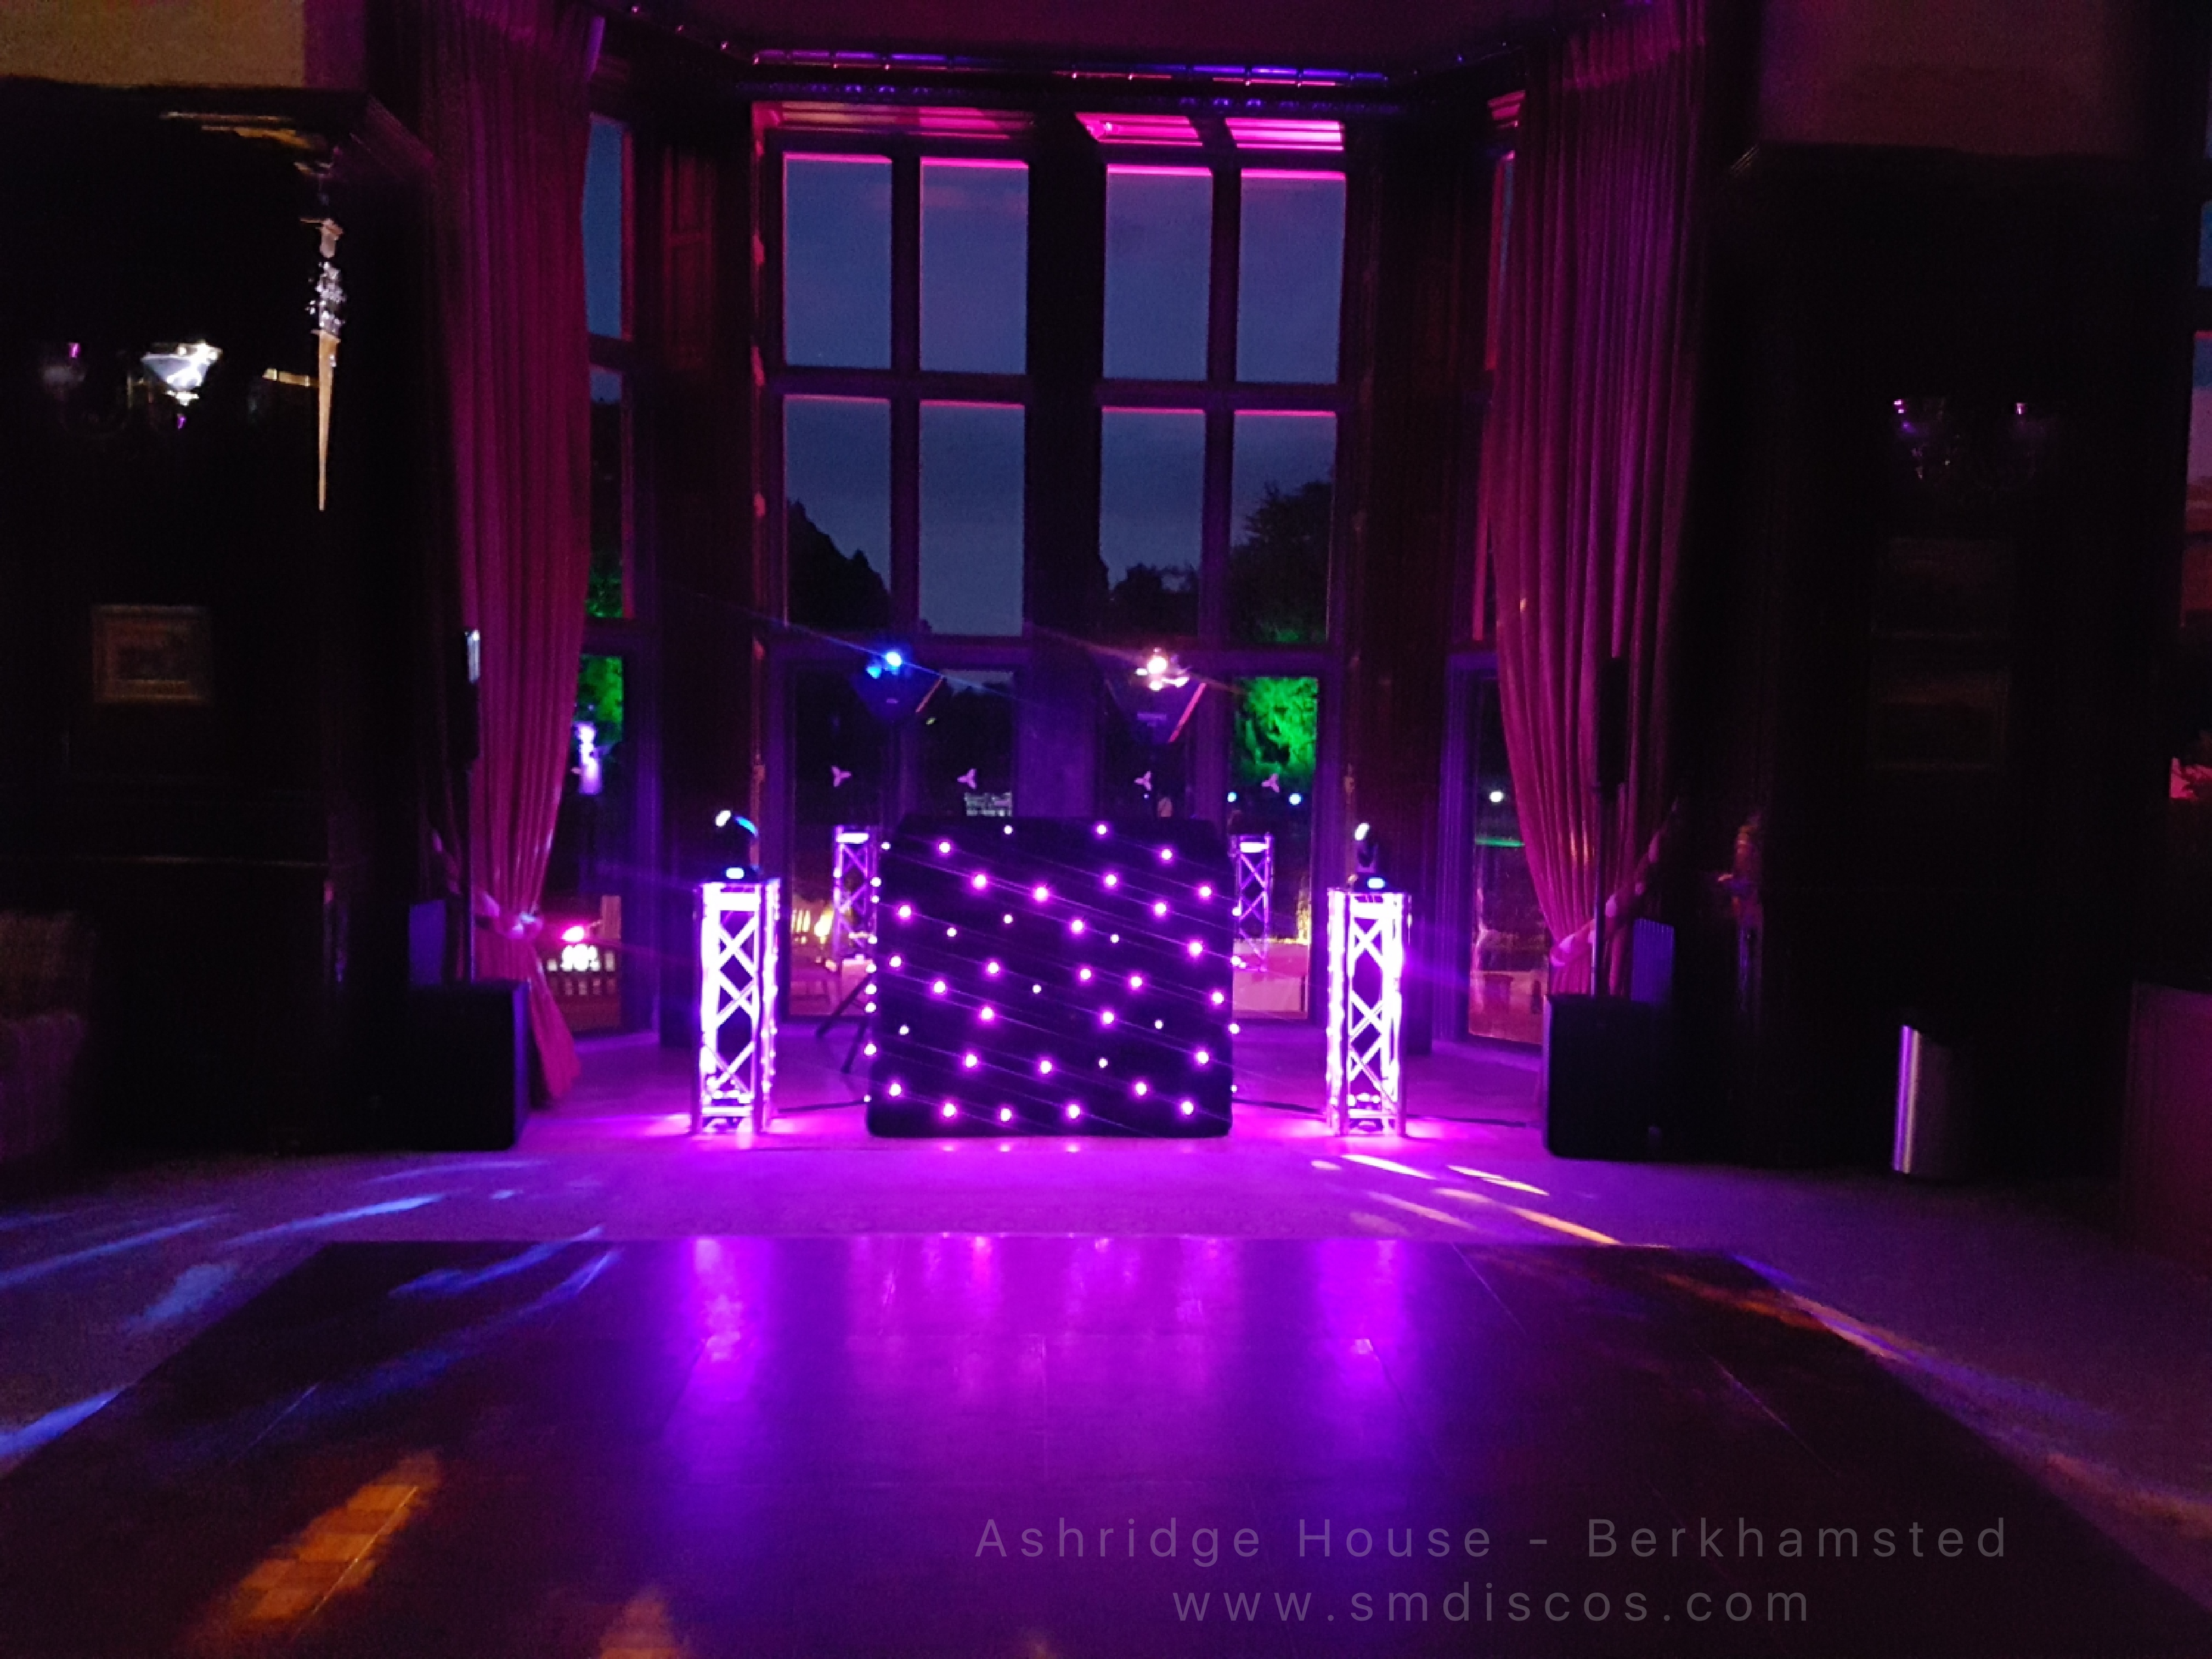 DJ Ashridge House Berkhamsted